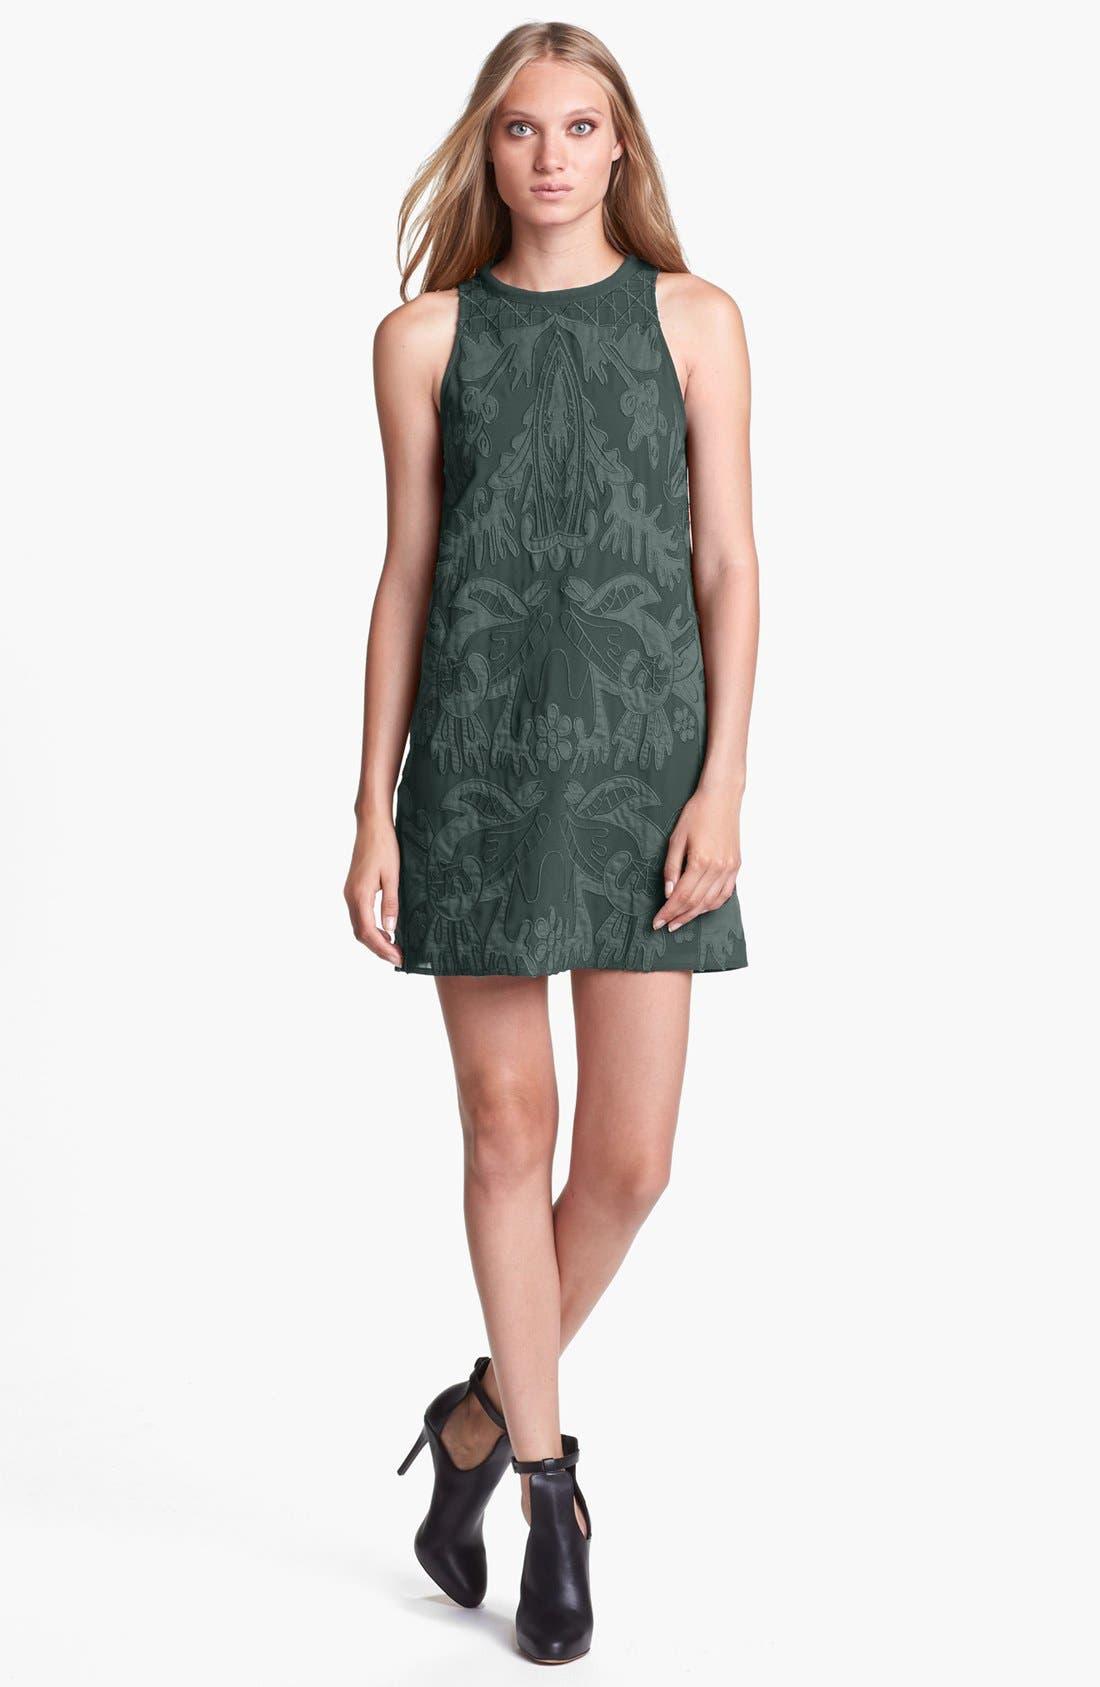 Alternate Image 1 Selected - ASTR Embroidered Shift Dress